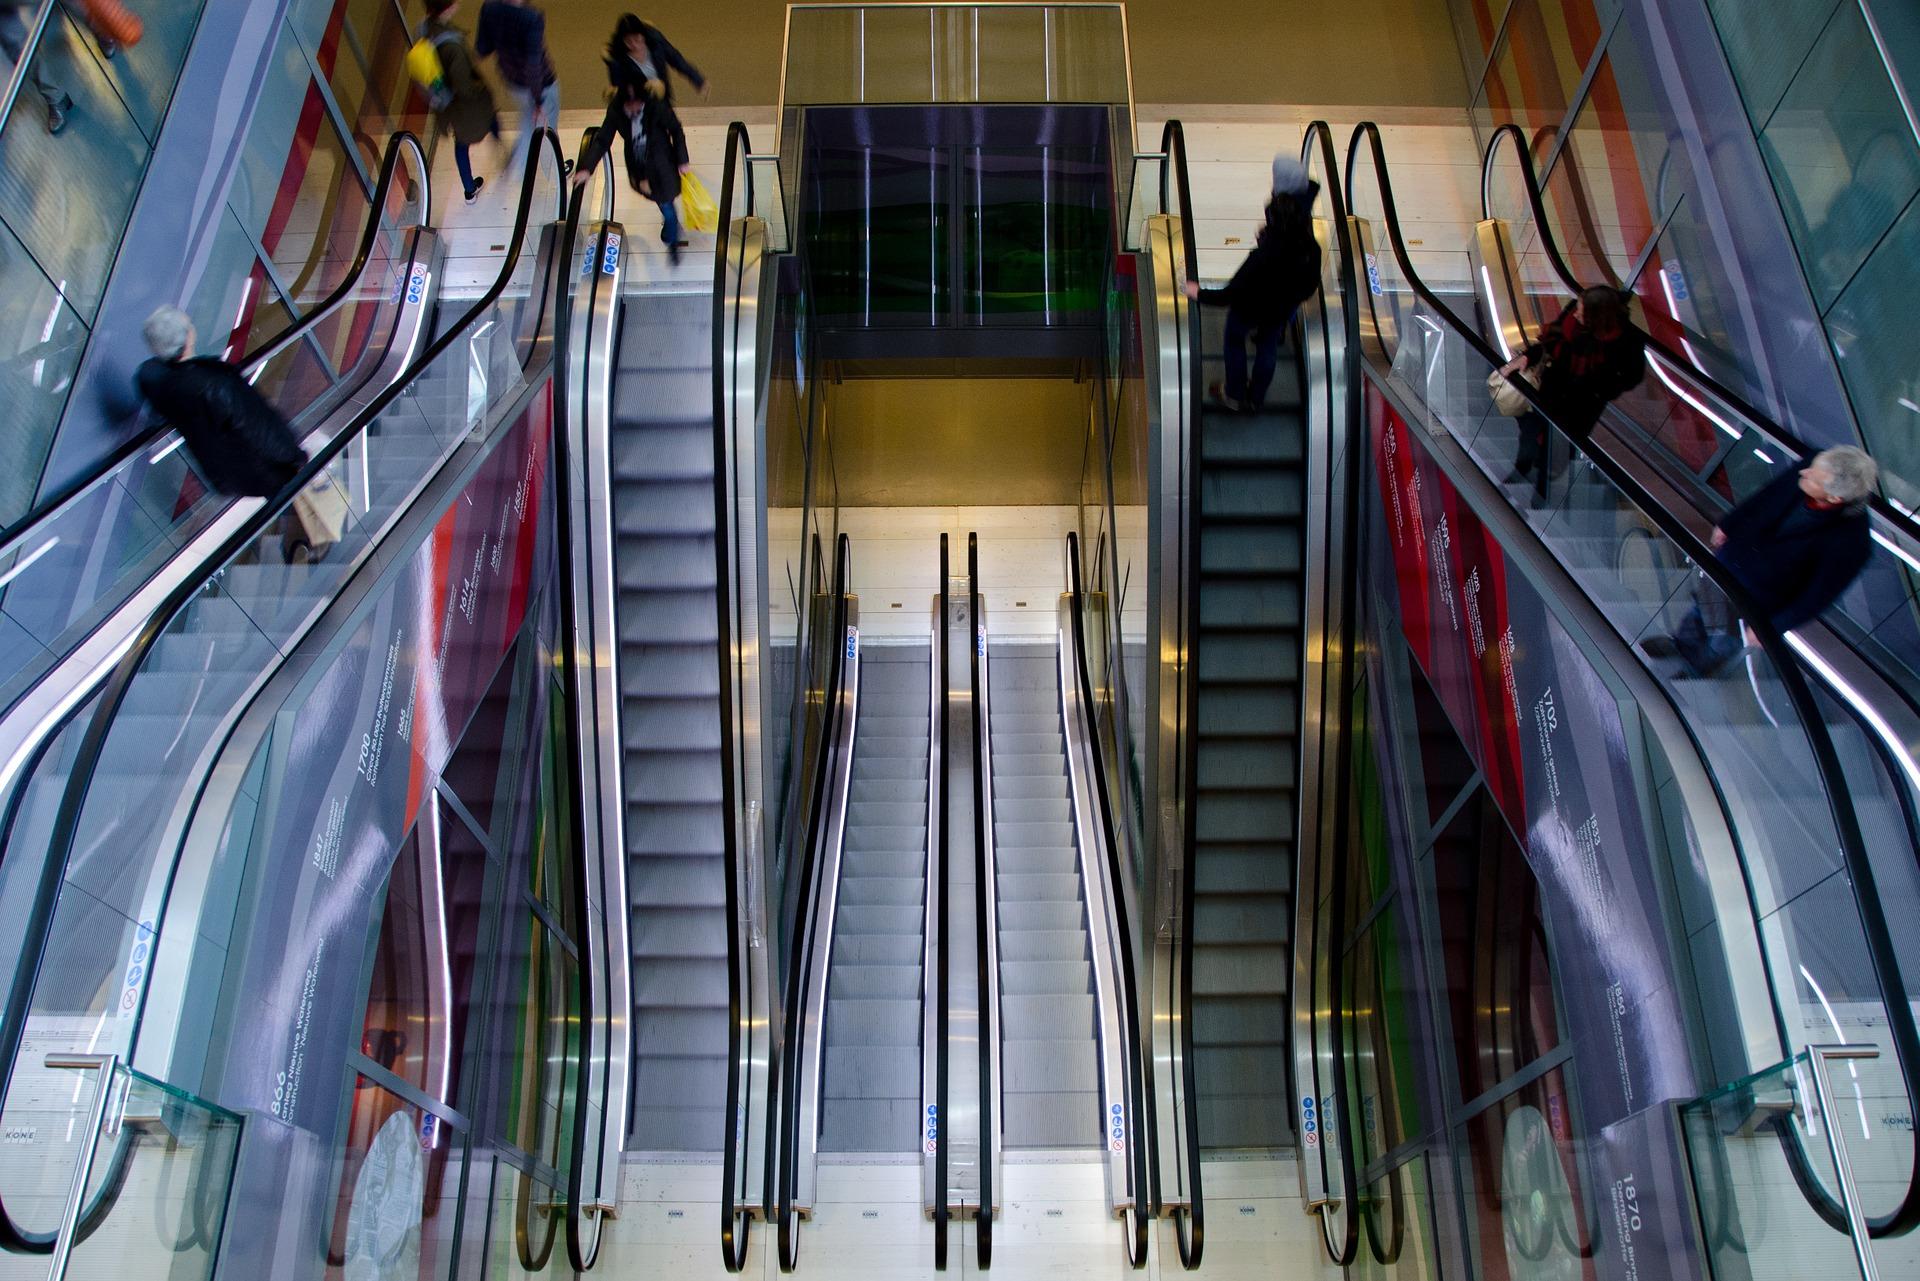 escalator-711793_1920